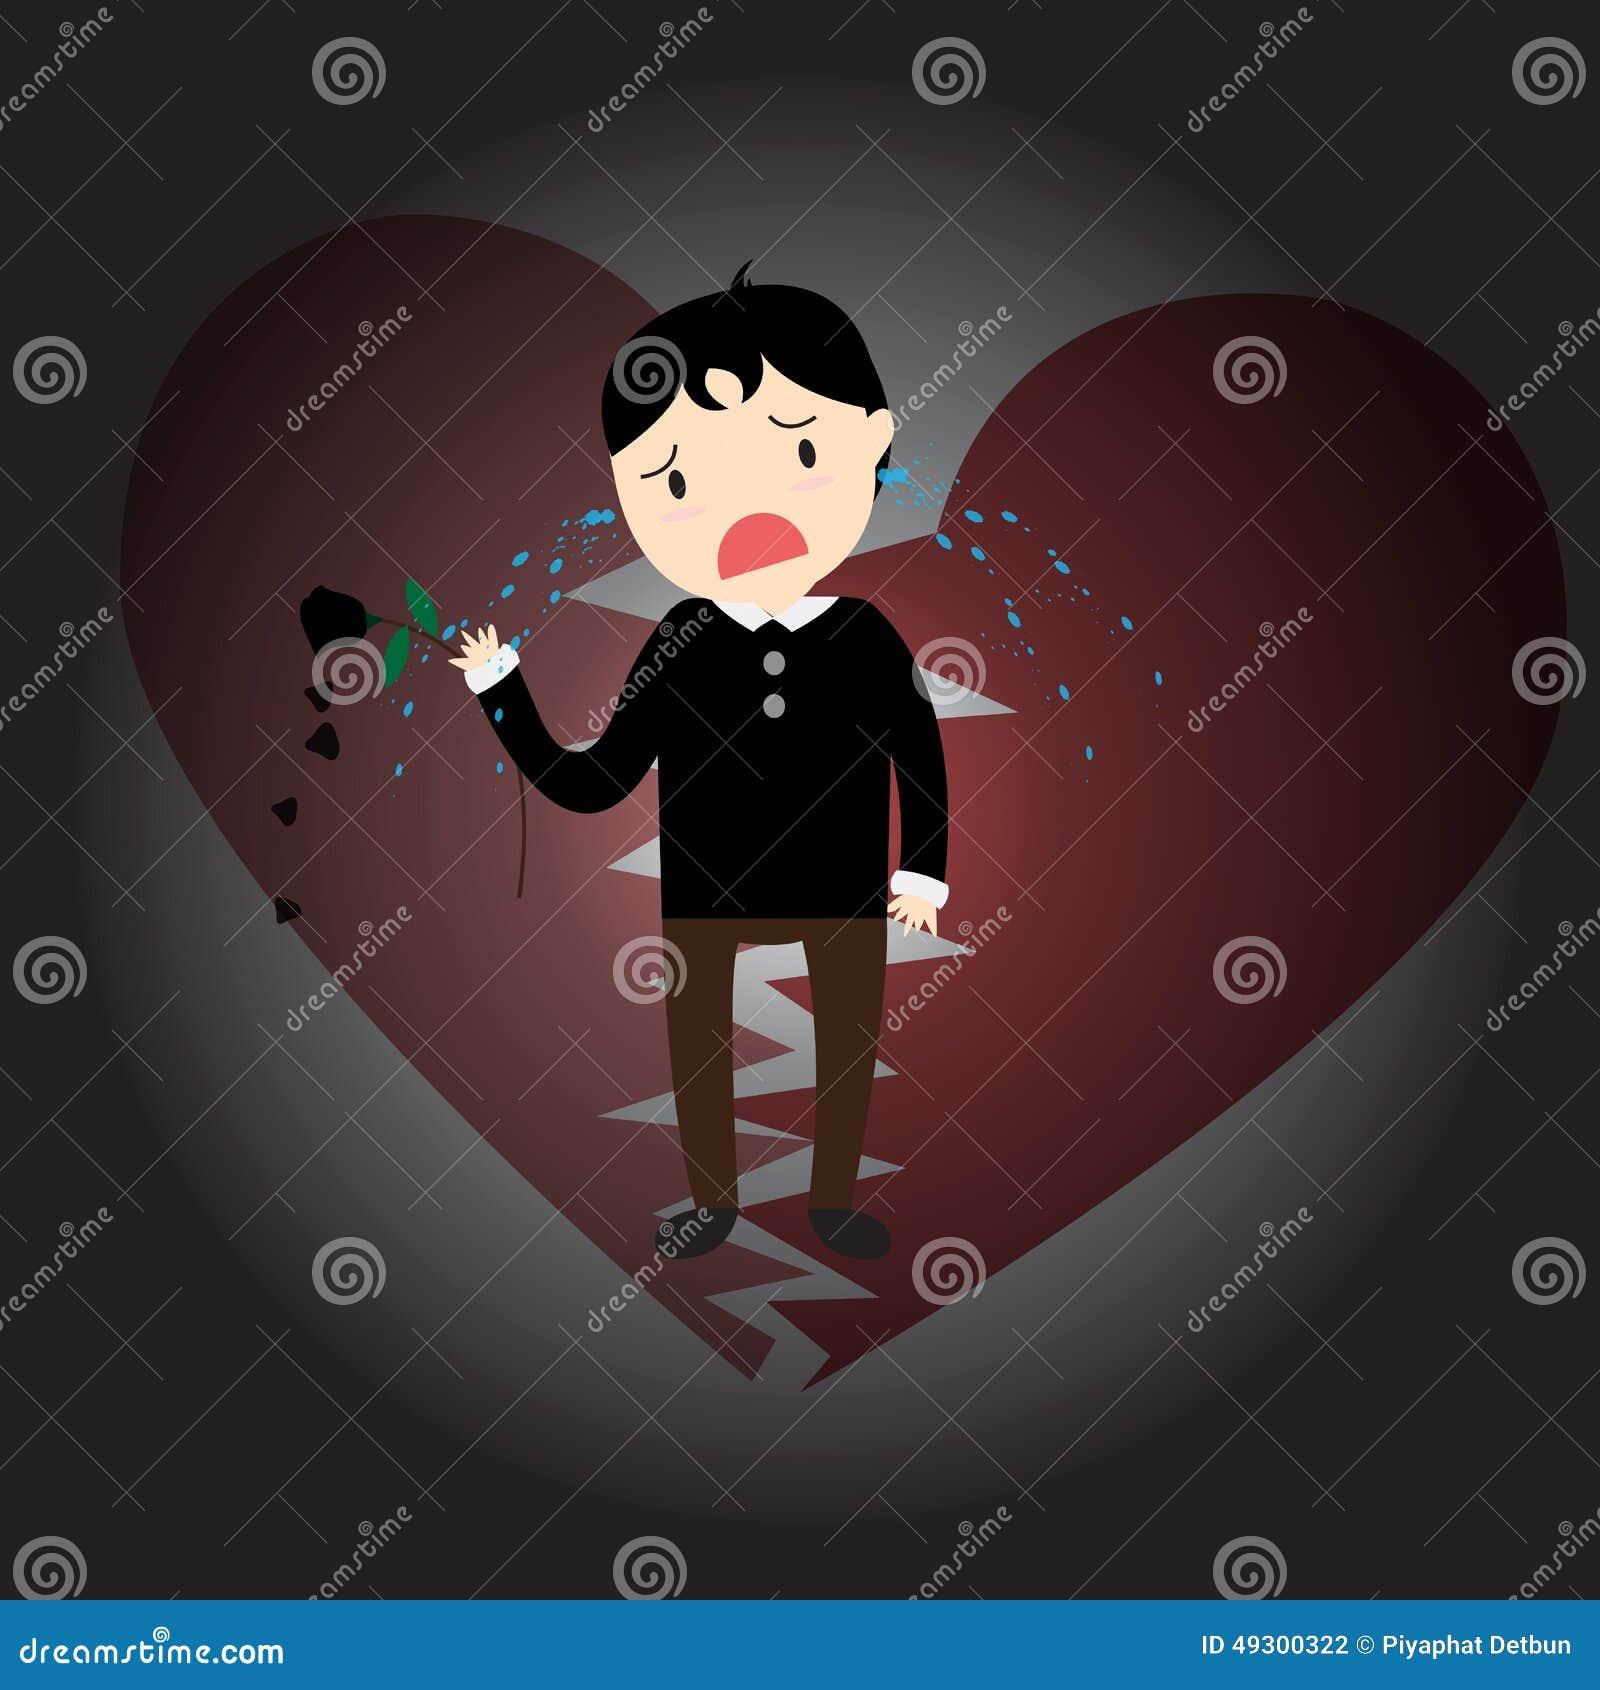 Heartbroken Stock Vector Illustration Of Romance Sadness 49300322